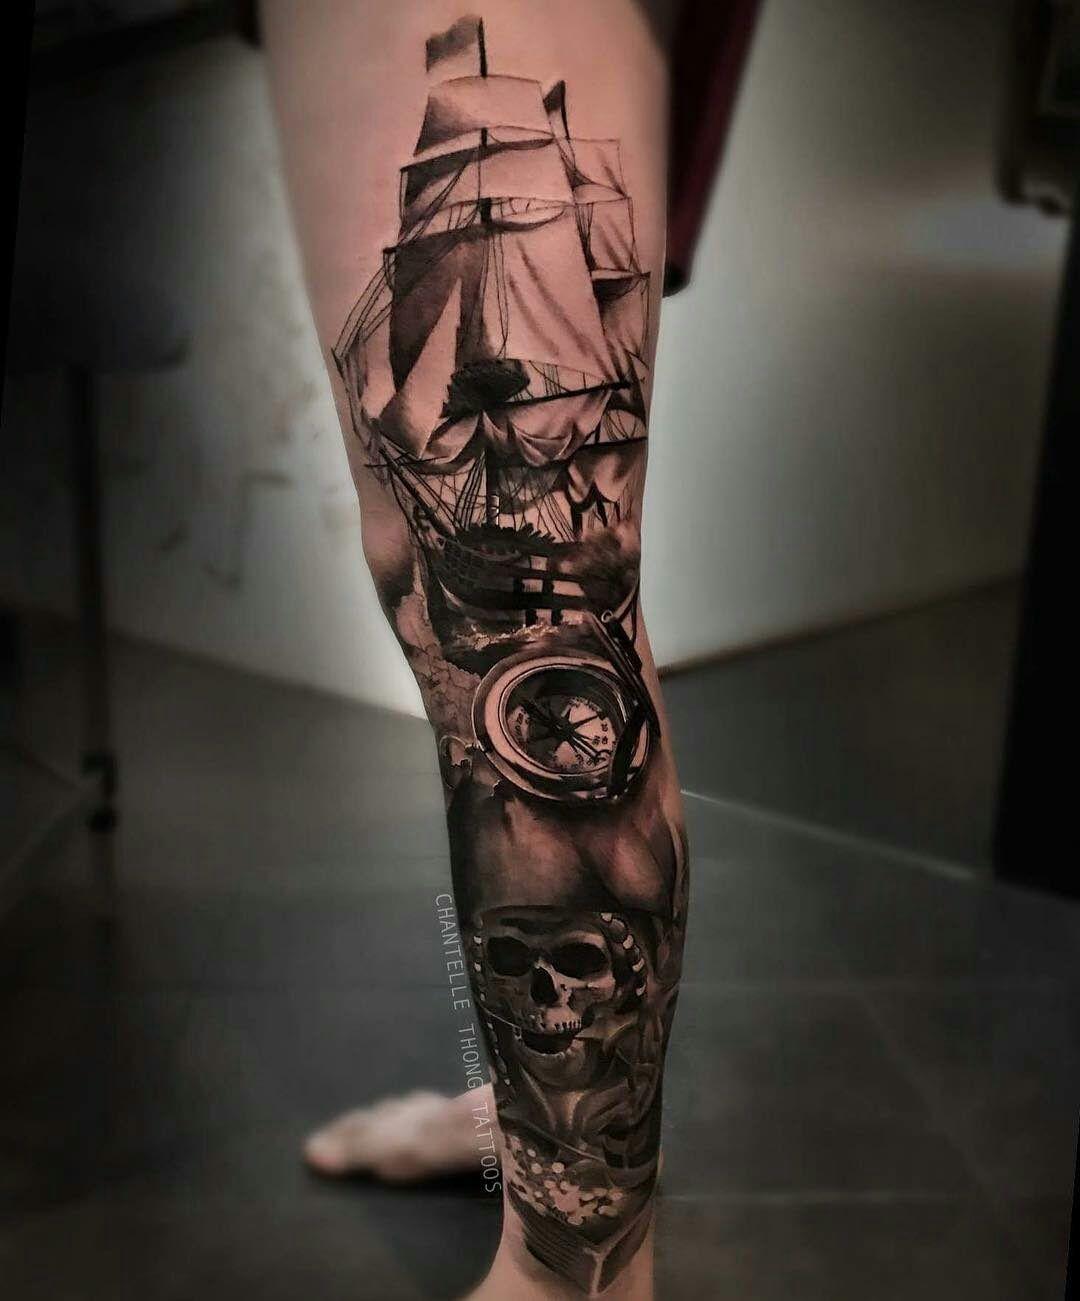 tatuajes de piratas tatuajes pinterest piratas tatuajes y ideas de tatuajes. Black Bedroom Furniture Sets. Home Design Ideas